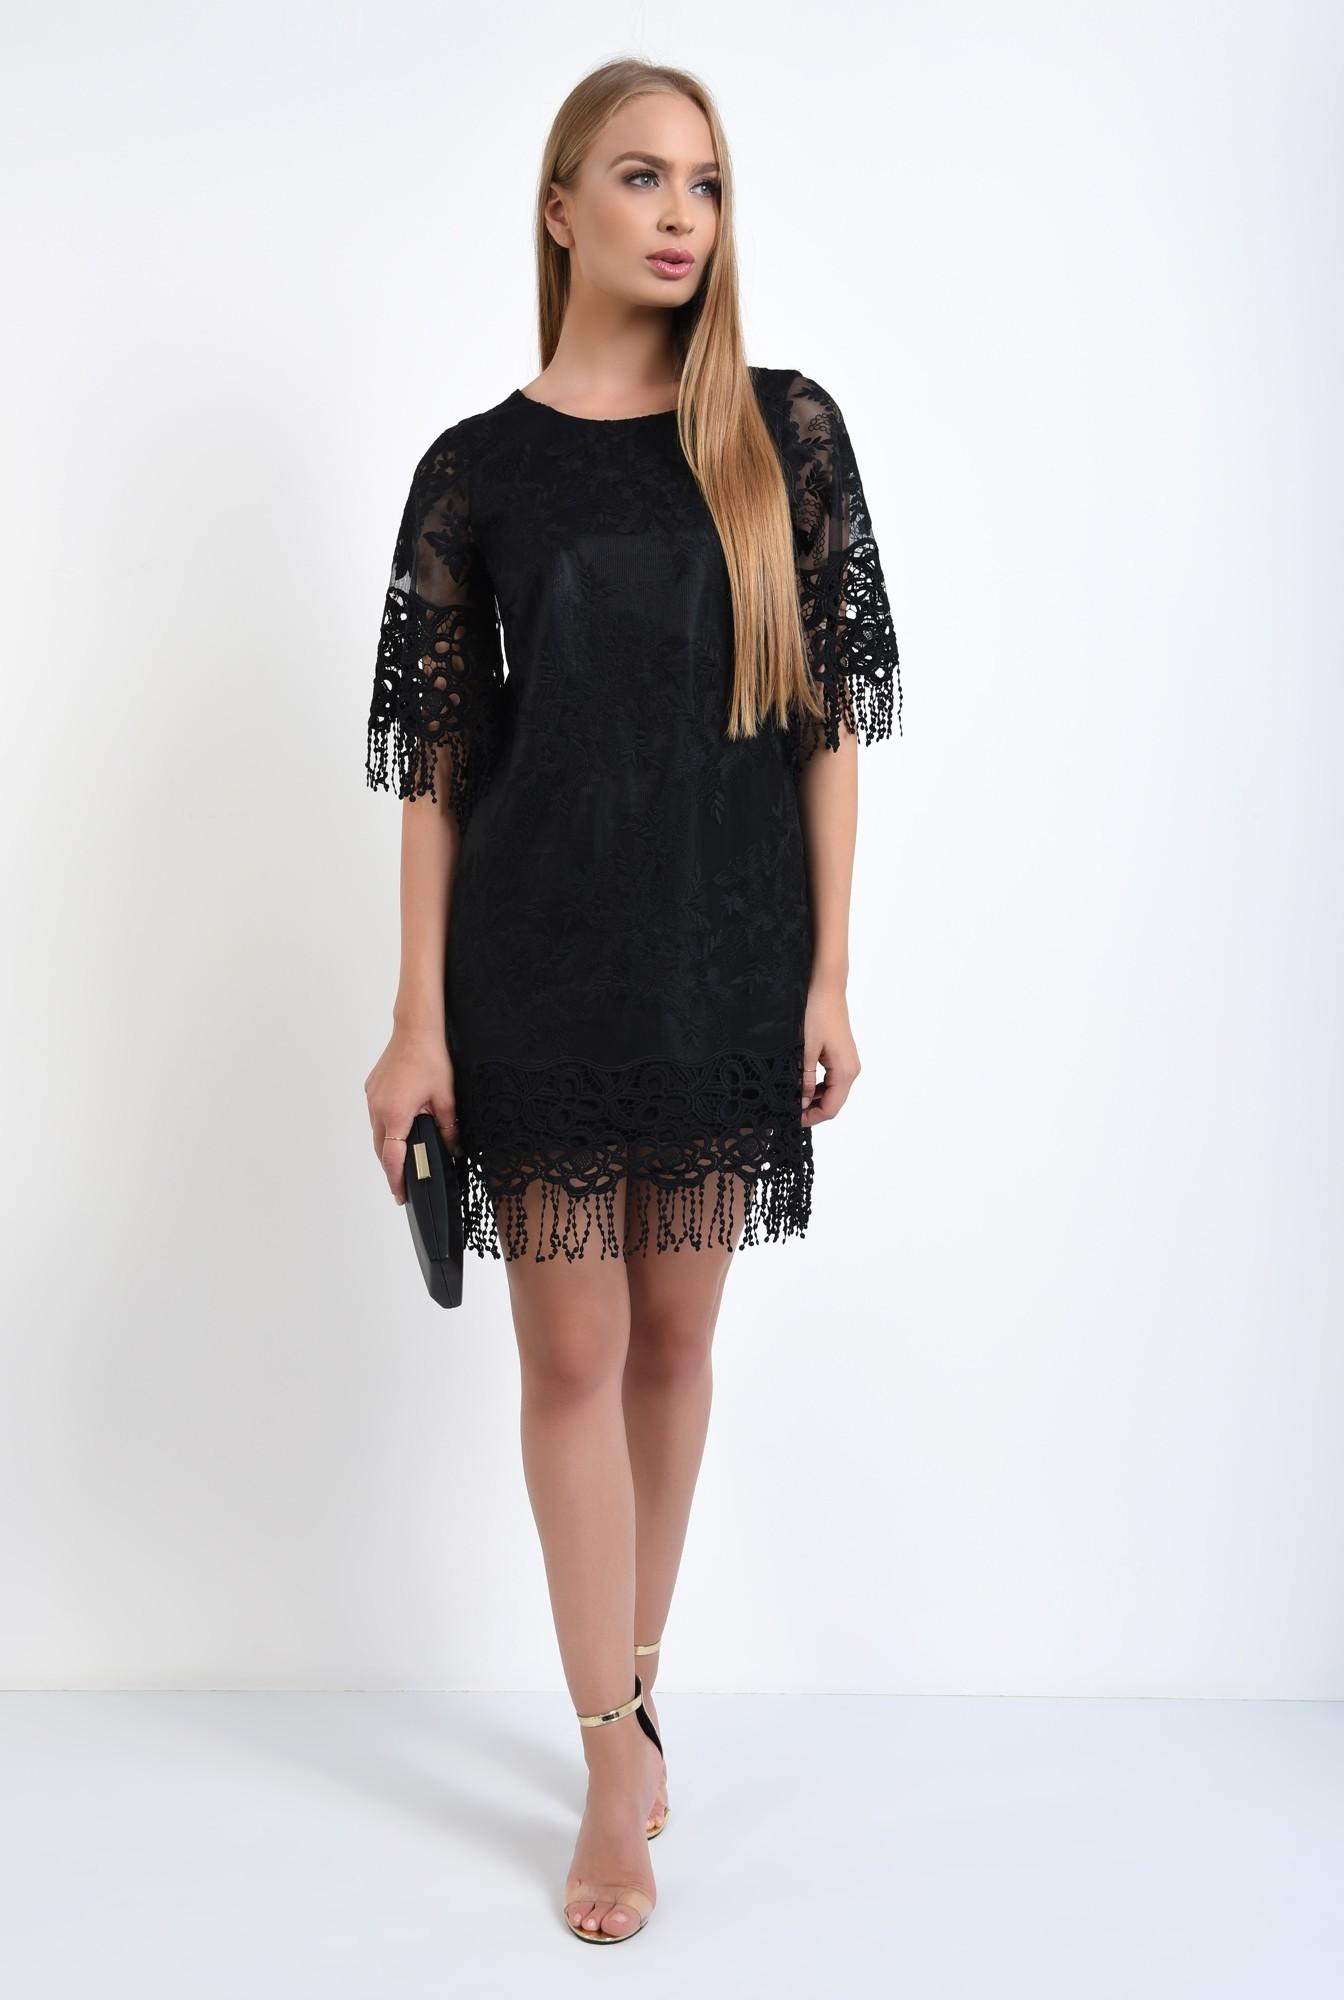 3 - rochie eleganta, dantela brodata, franjuri, rochii online